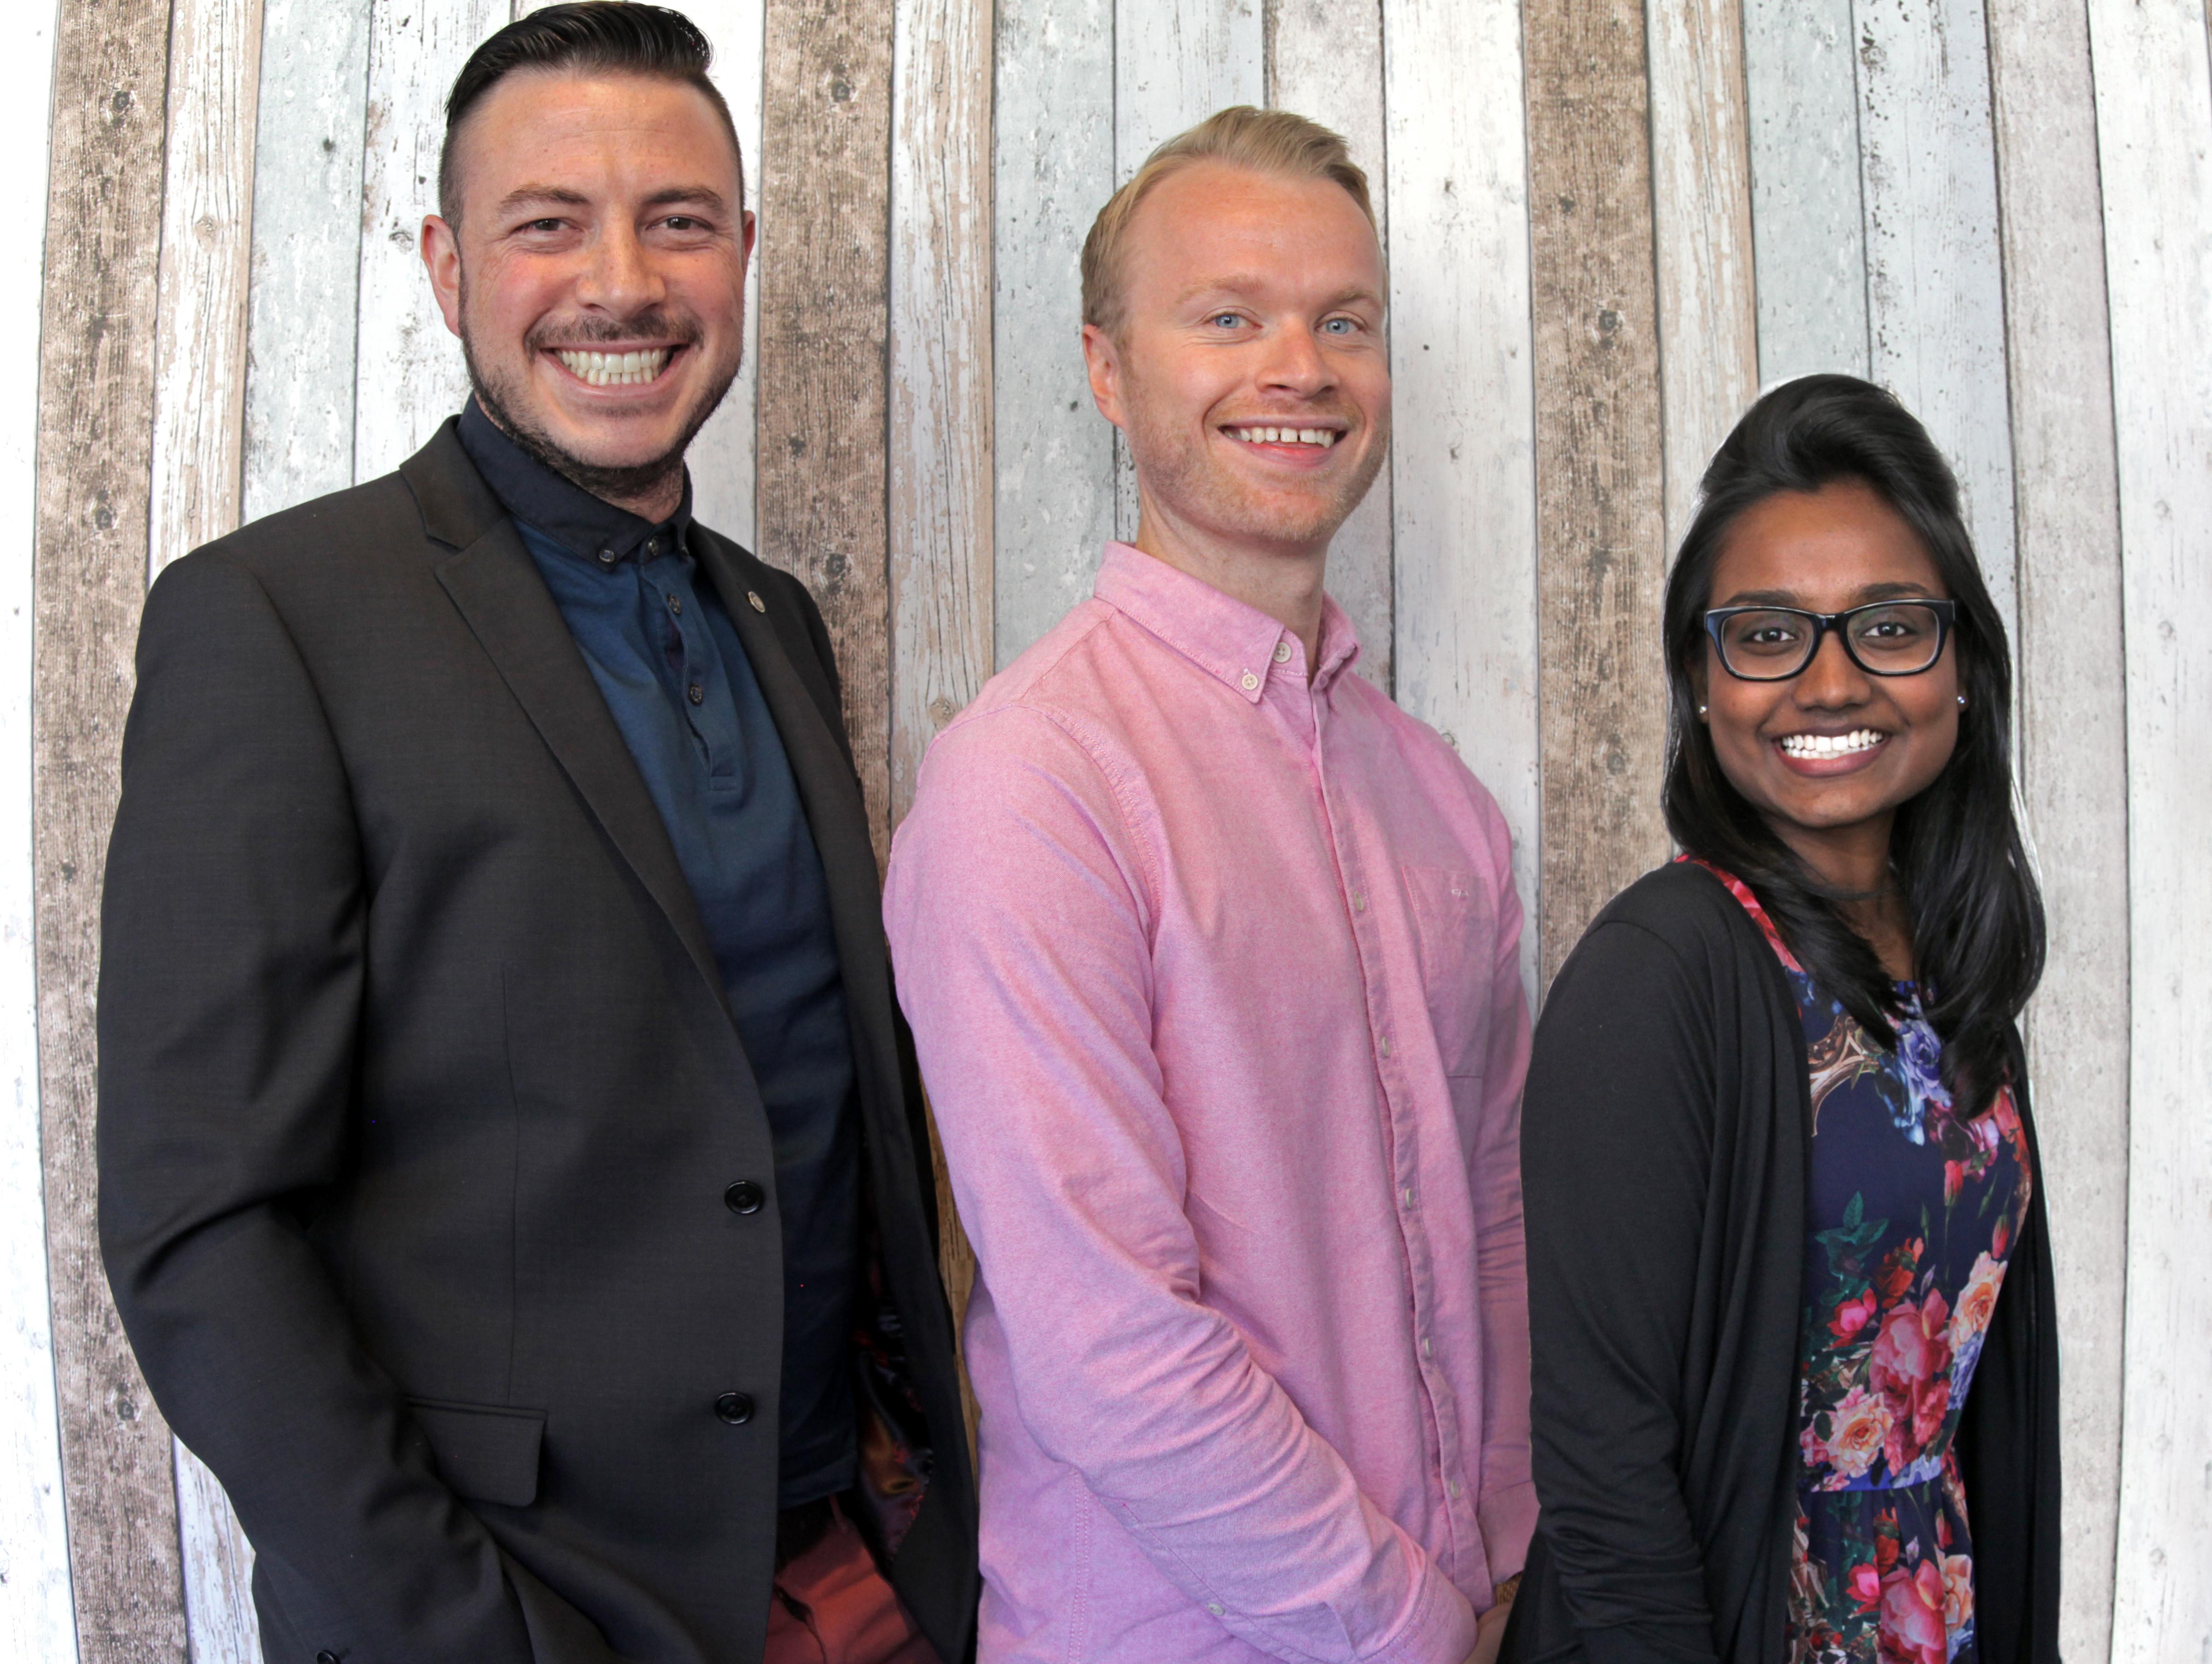 Aaron Chilcott, Colin Fairley, Dhanuj Selvaraj